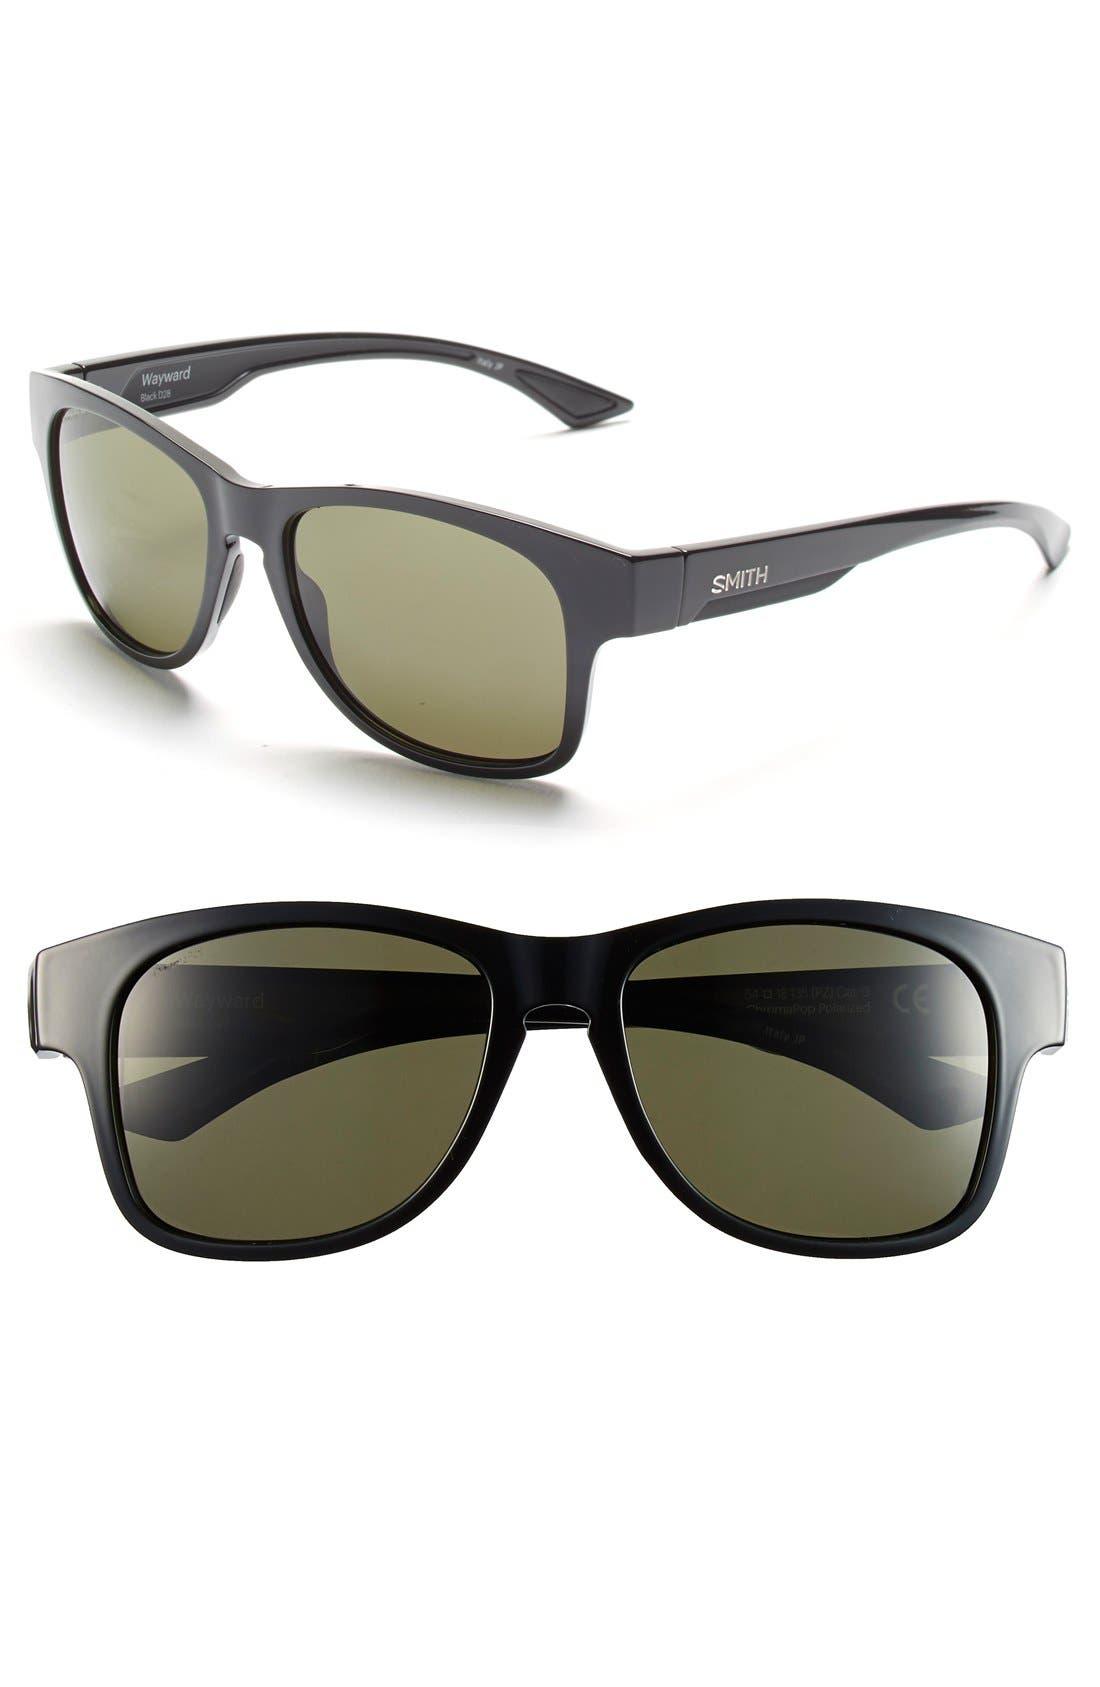 'Wayward' 54mm Polarized Sunglasses,                         Main,                         color, Black/ Polar Gray Green